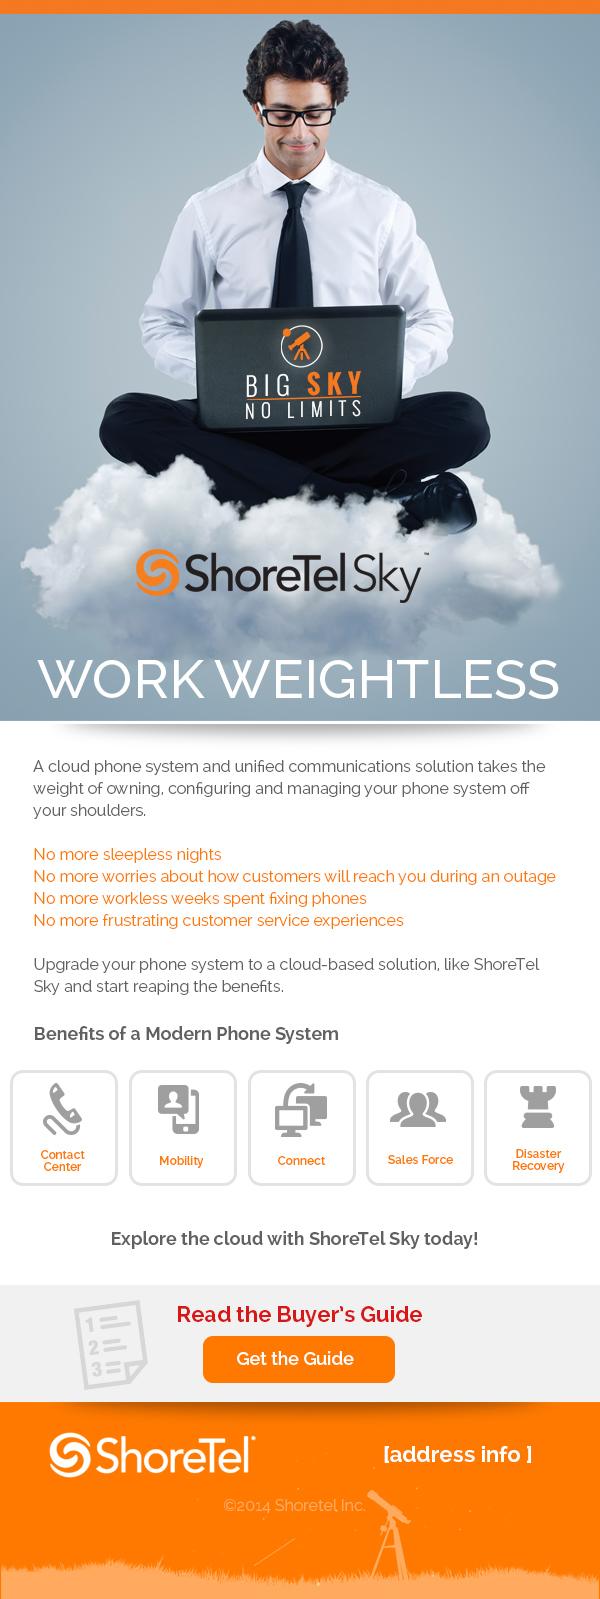 ShoreTel Sky email marketing